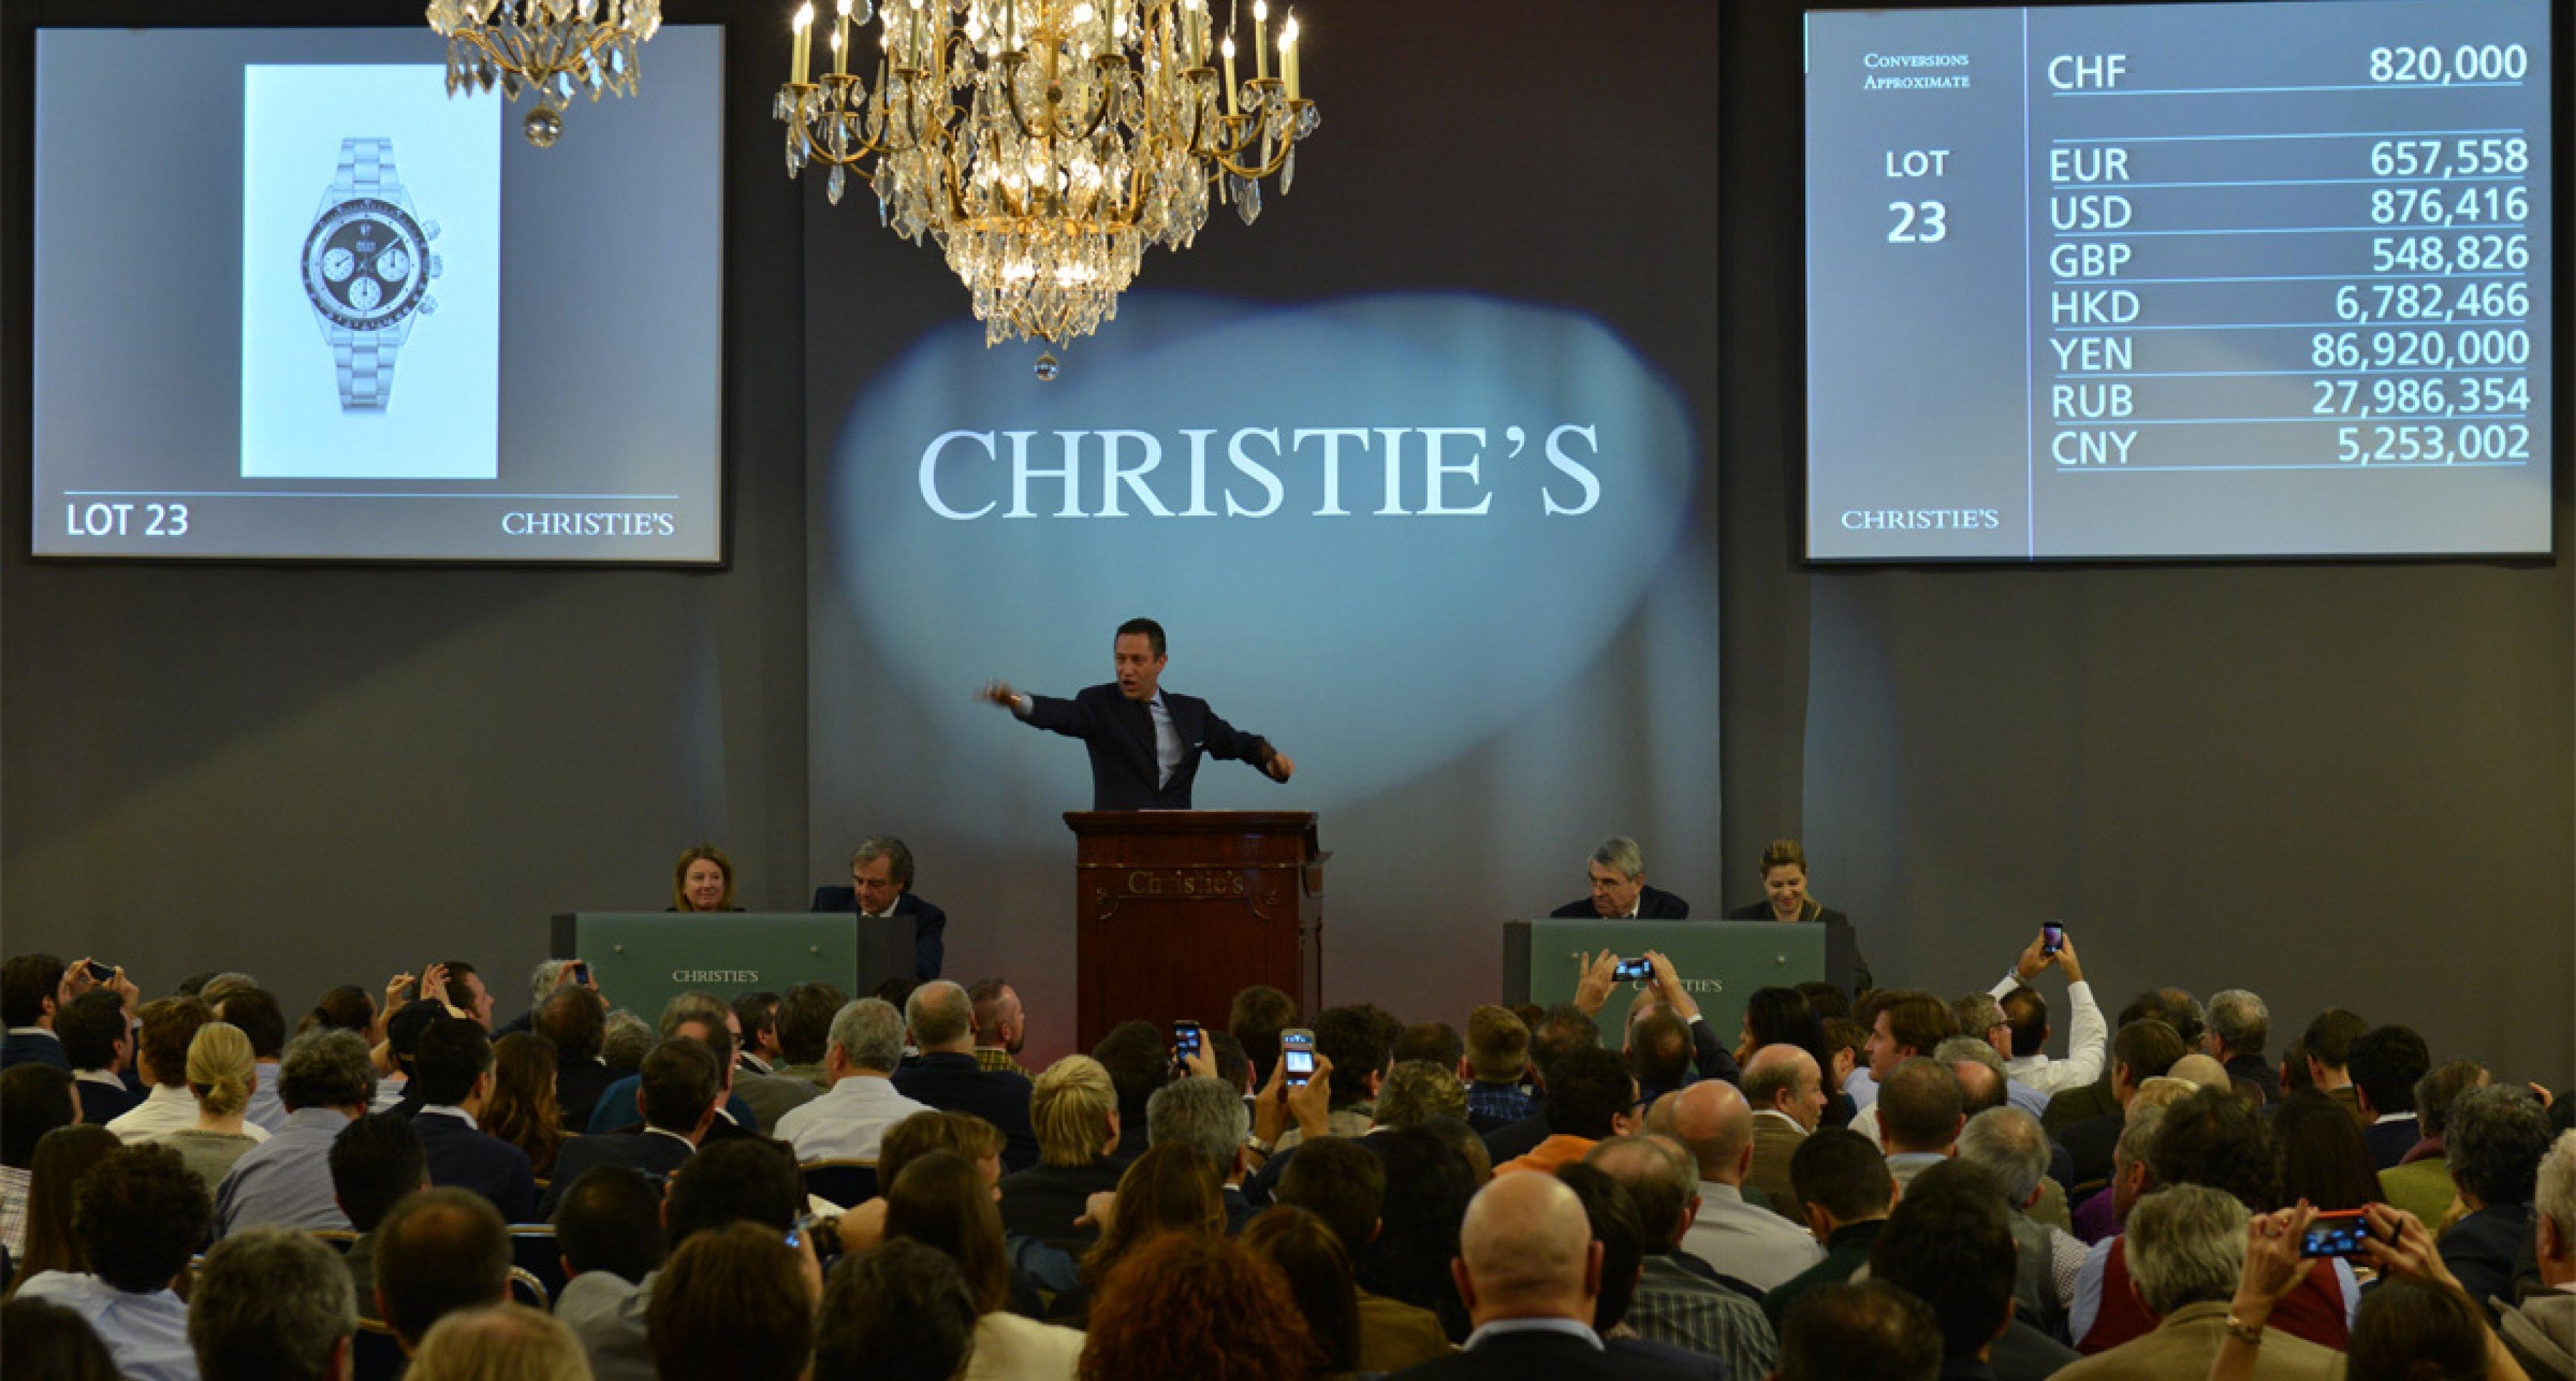 Christie's Auctioneer Aurel Bacs in his element at the Rolex Daytona Auction in Geneva